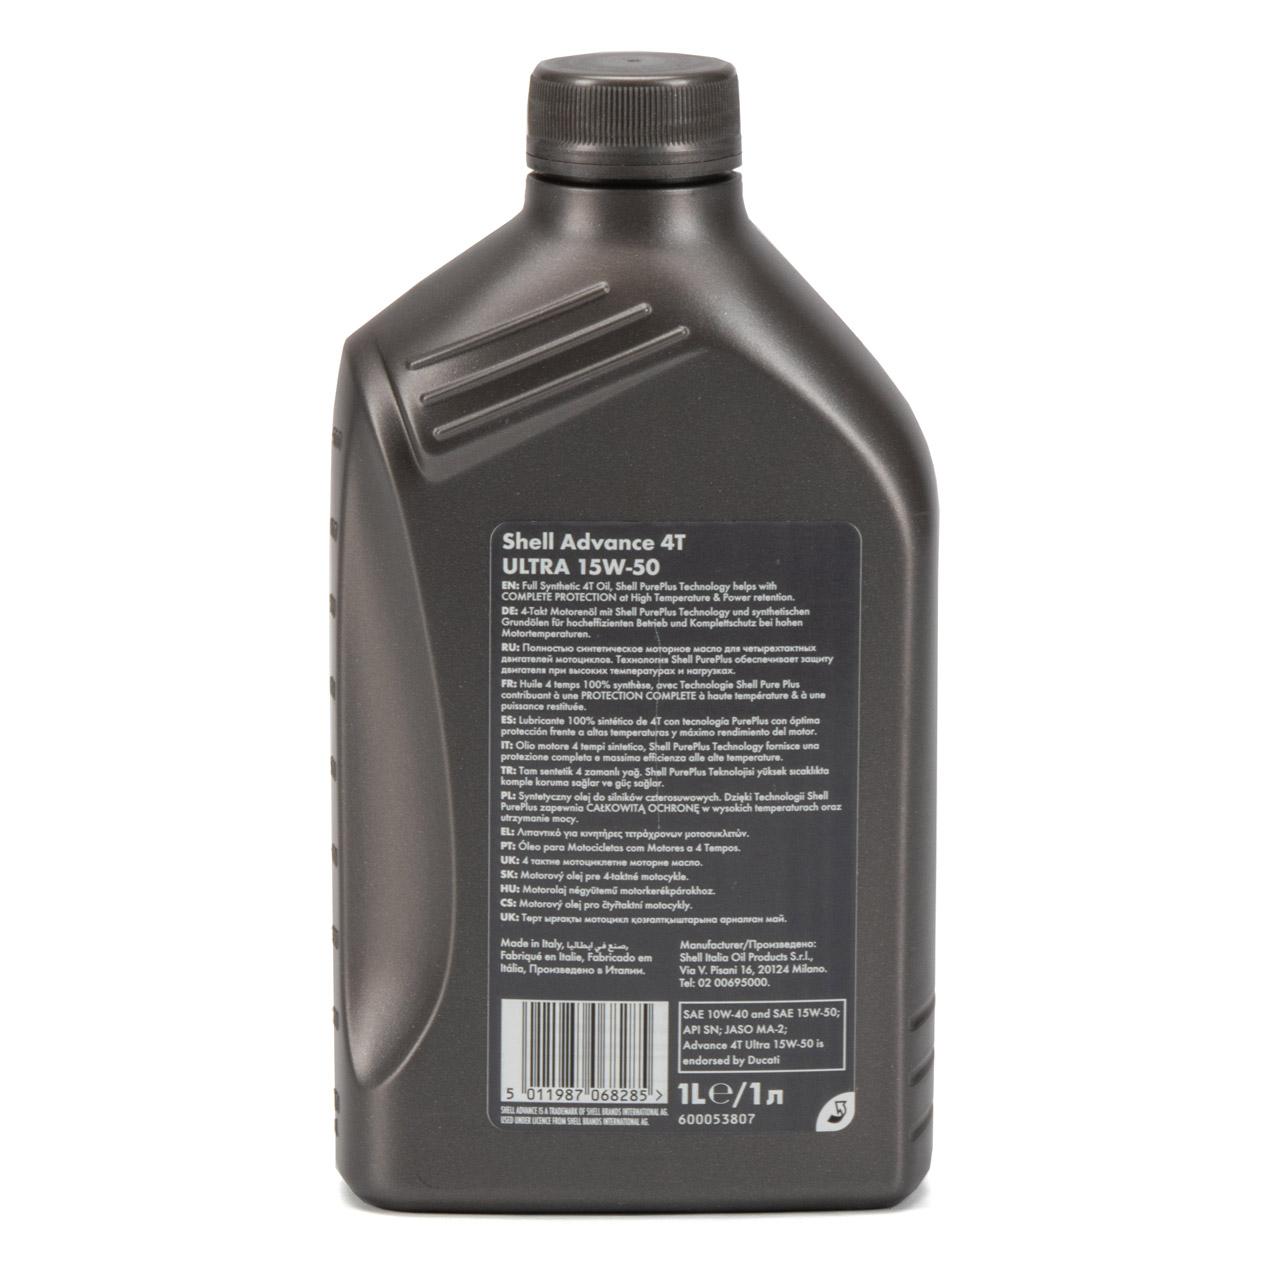 SHELL Motoröl Öl ADVANCE ULTRA 4T 4-TAKT 15W-50 API SN JASO MA-2 - 1L 1 Liter